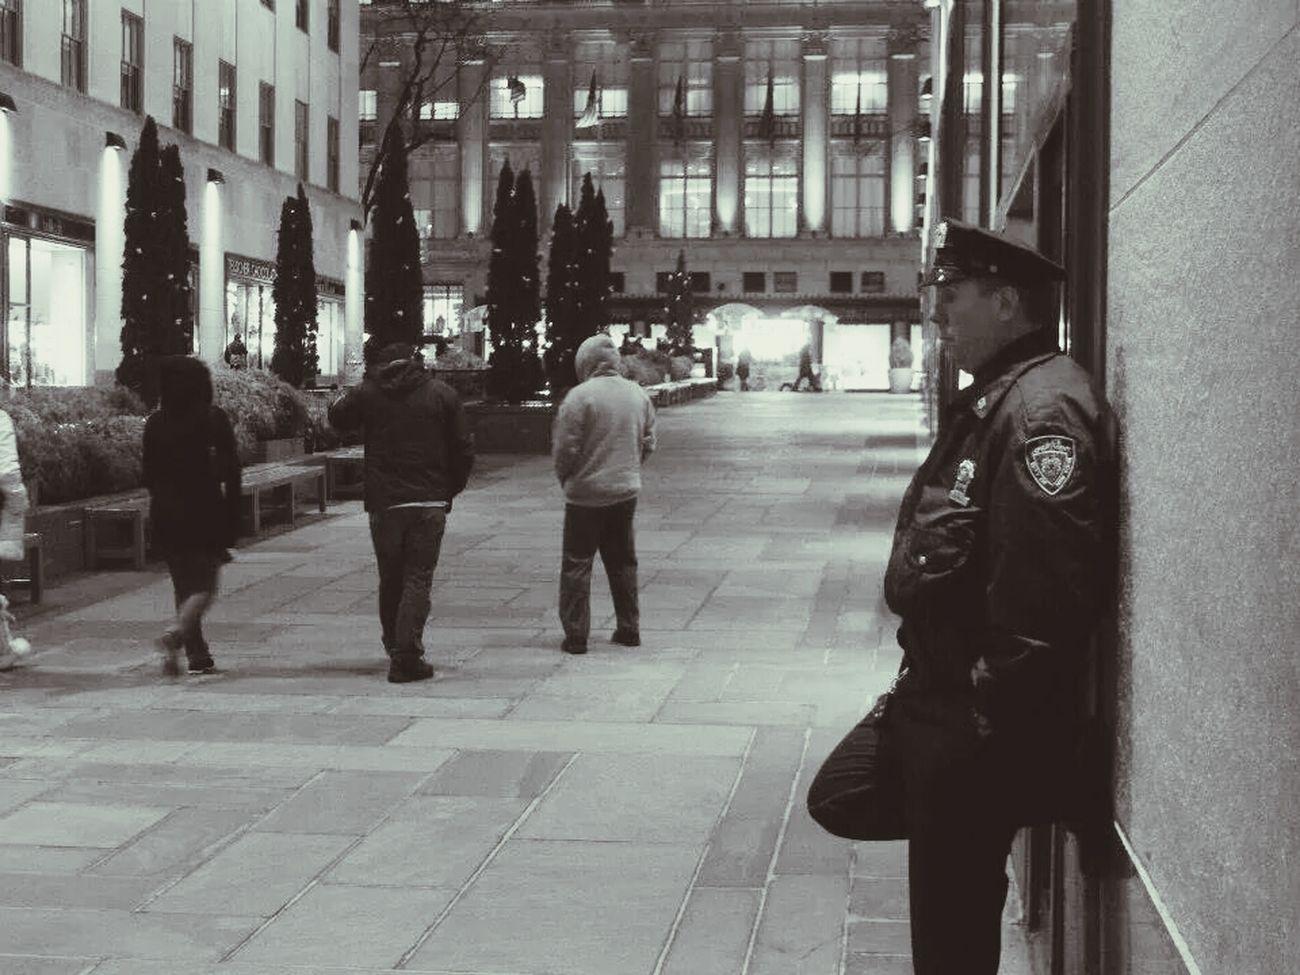 Street Photography Monochrome Rockerfeller The Portraitist - 2014 EyeEm Awards